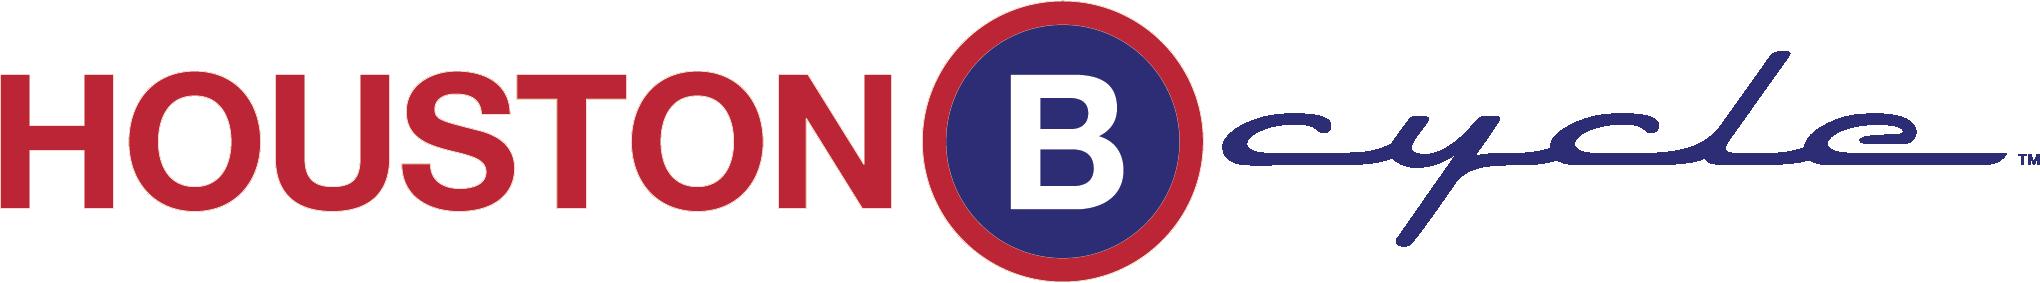 Houston BCycle Logo